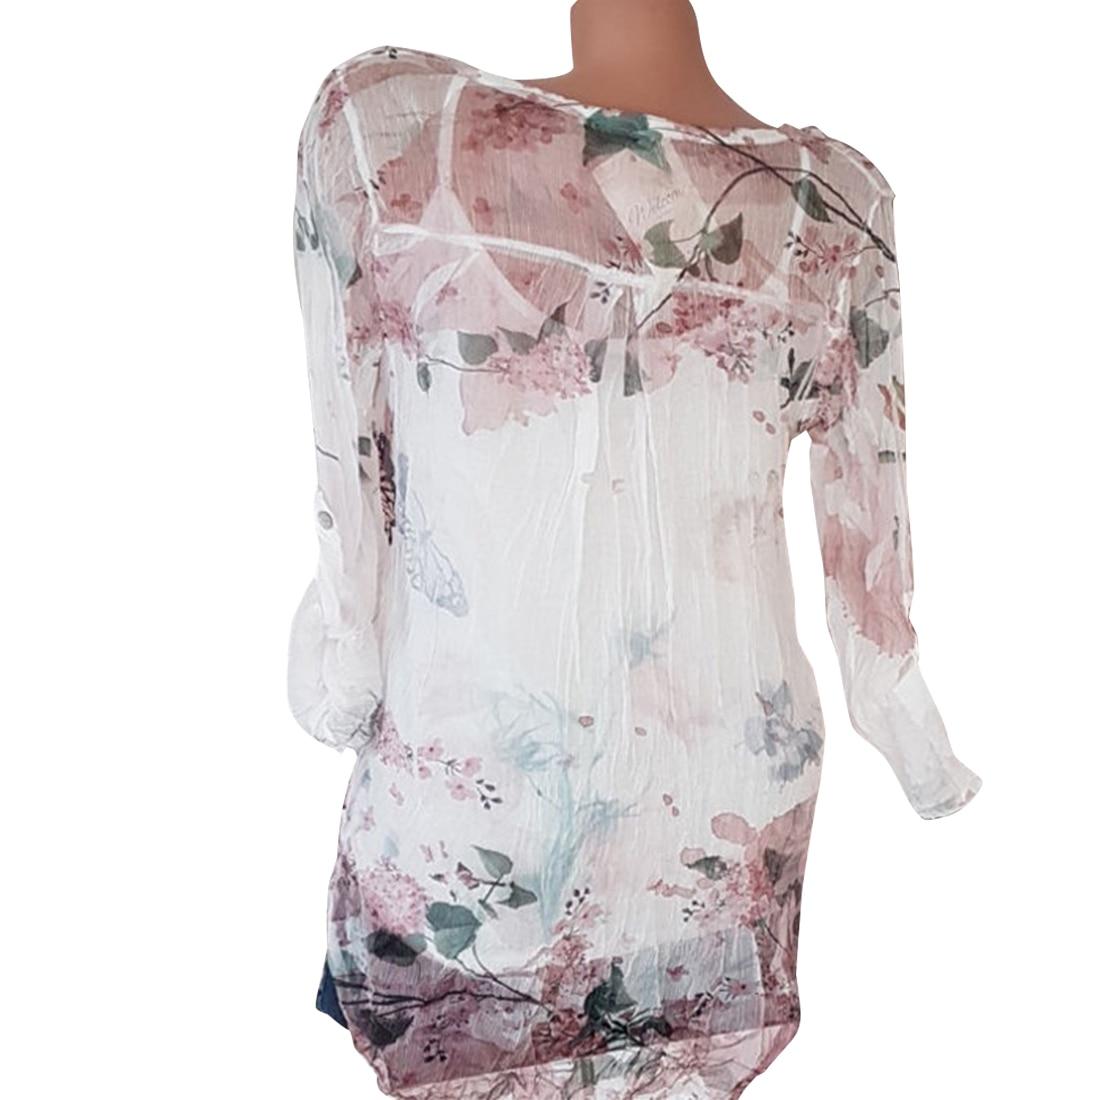 2019 Fashion Women Plus Size Chiffon Shirt Sexy V-Neck Full Sleeve Autumn Blusa Feminina Women Blouse Tops Single-Breasted Print